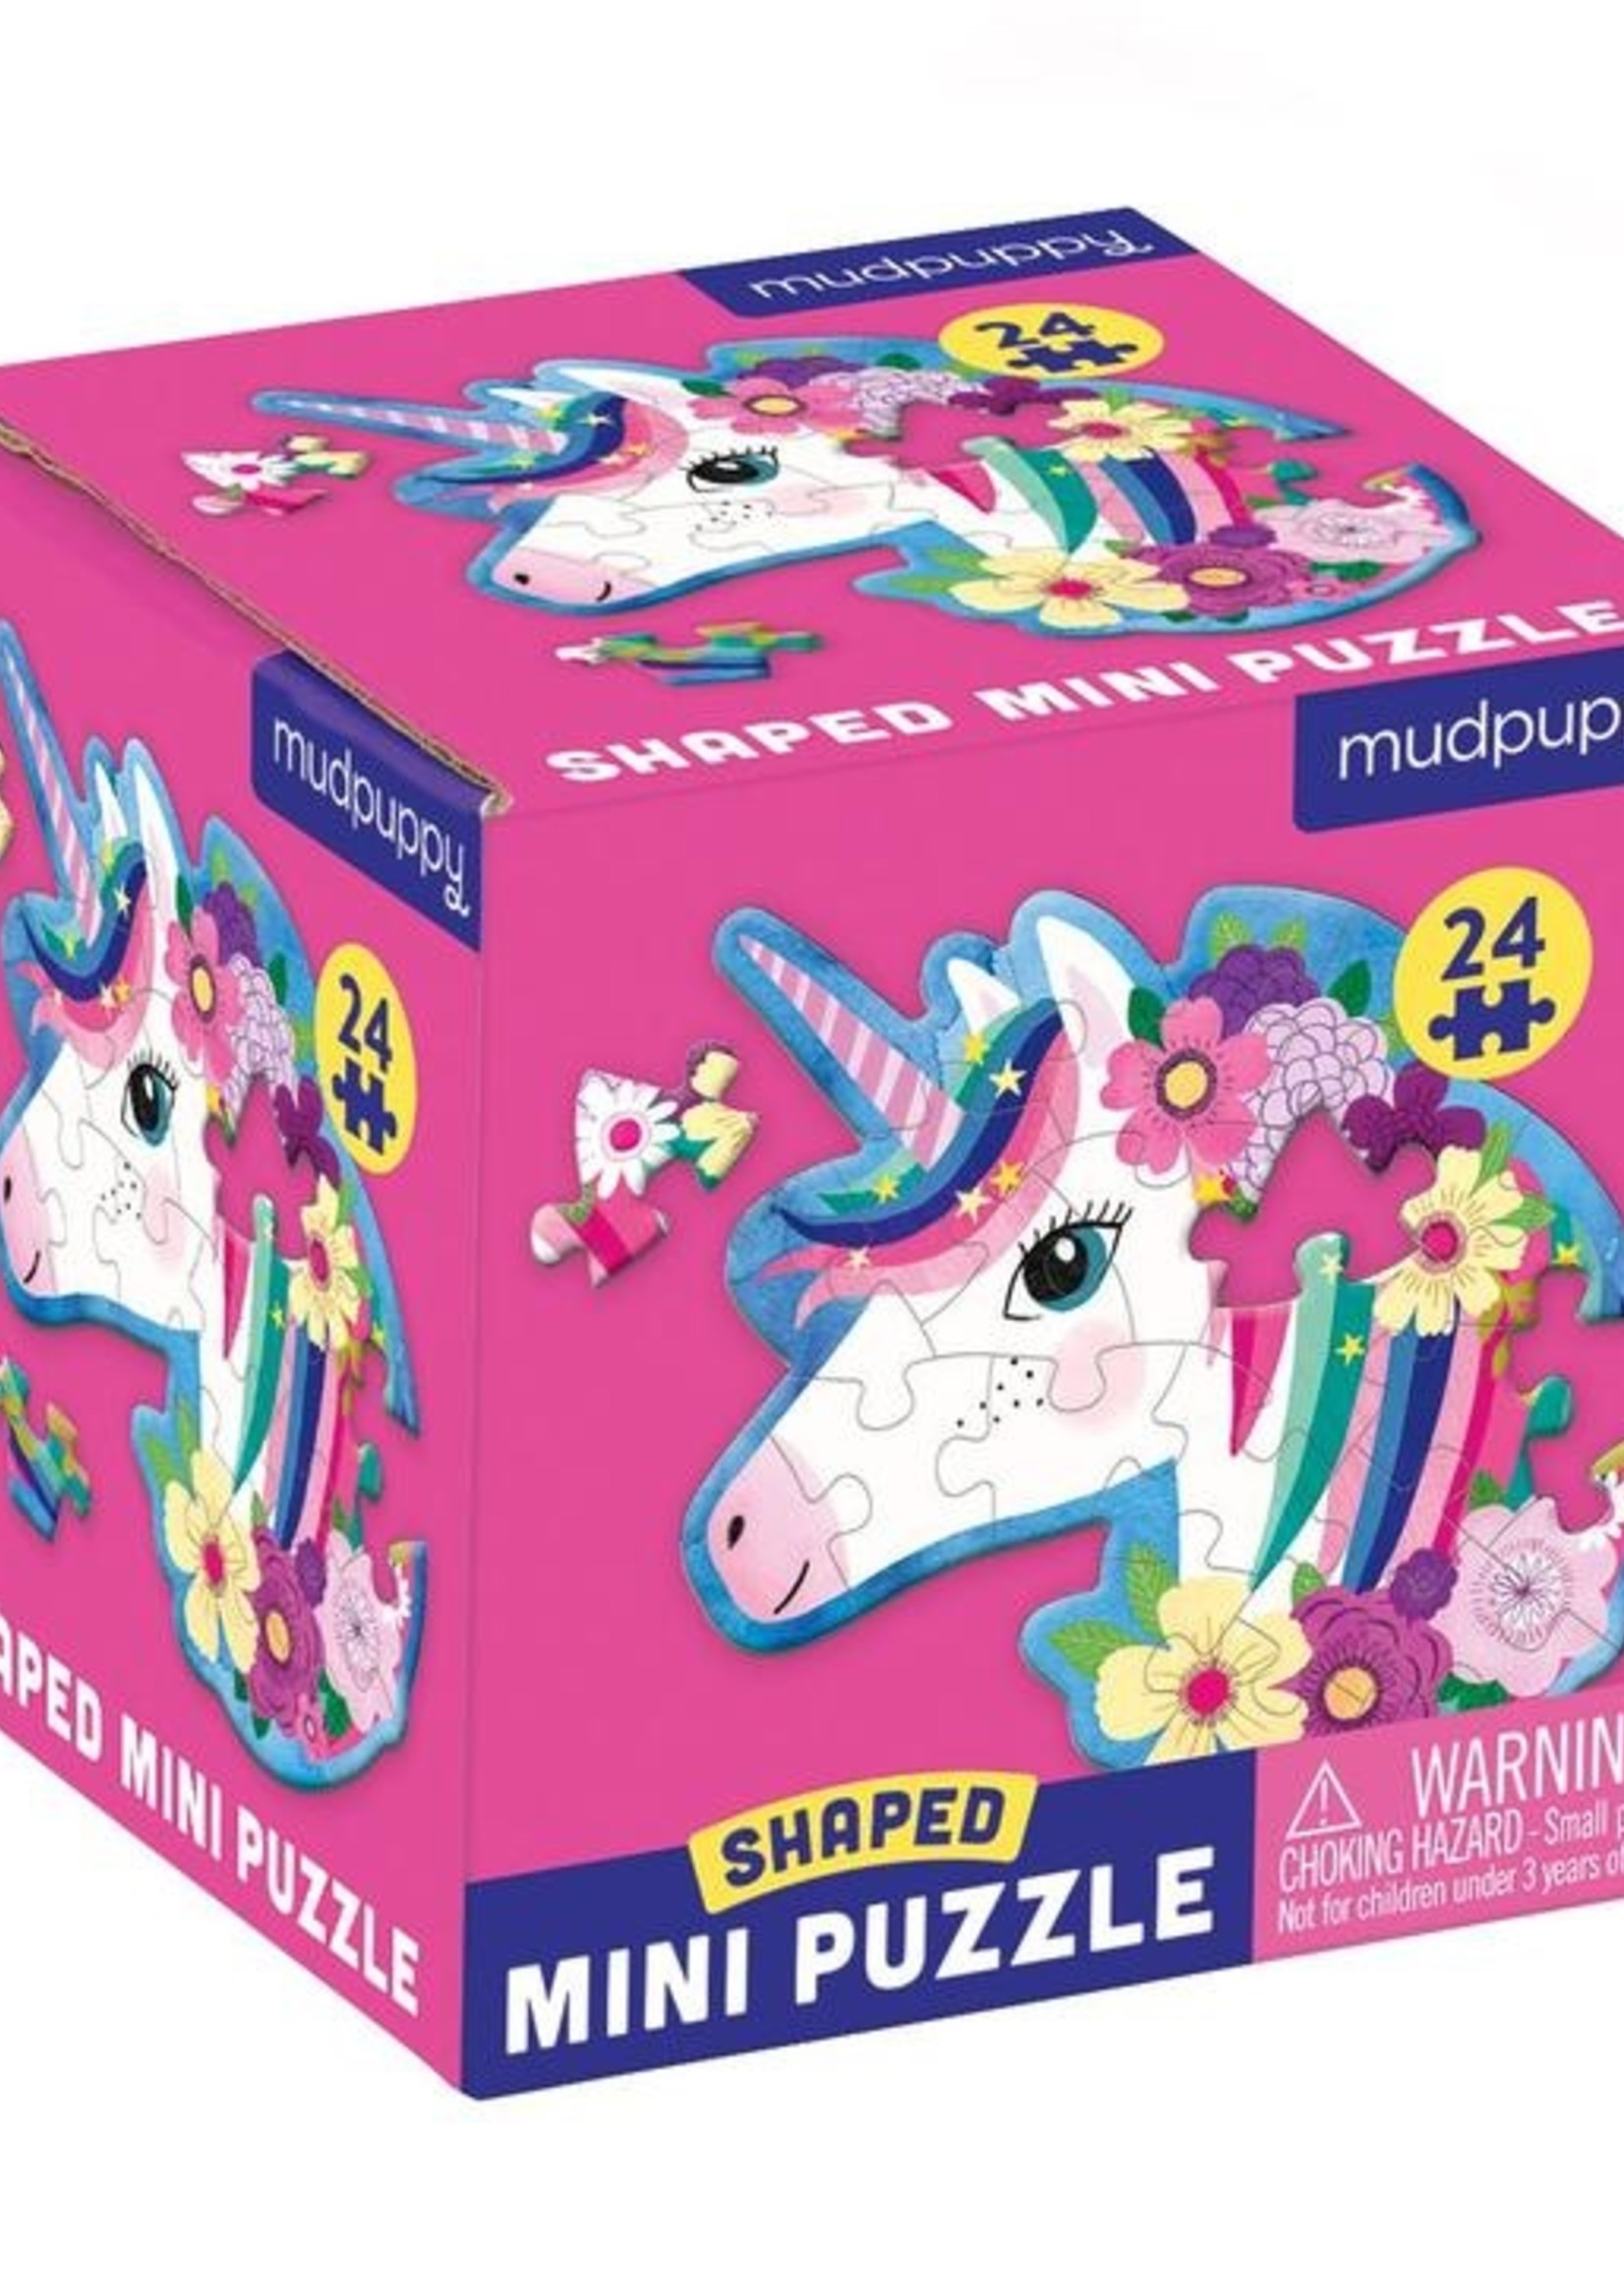 hatchett book group Unicorn 24 piece mini puzzle